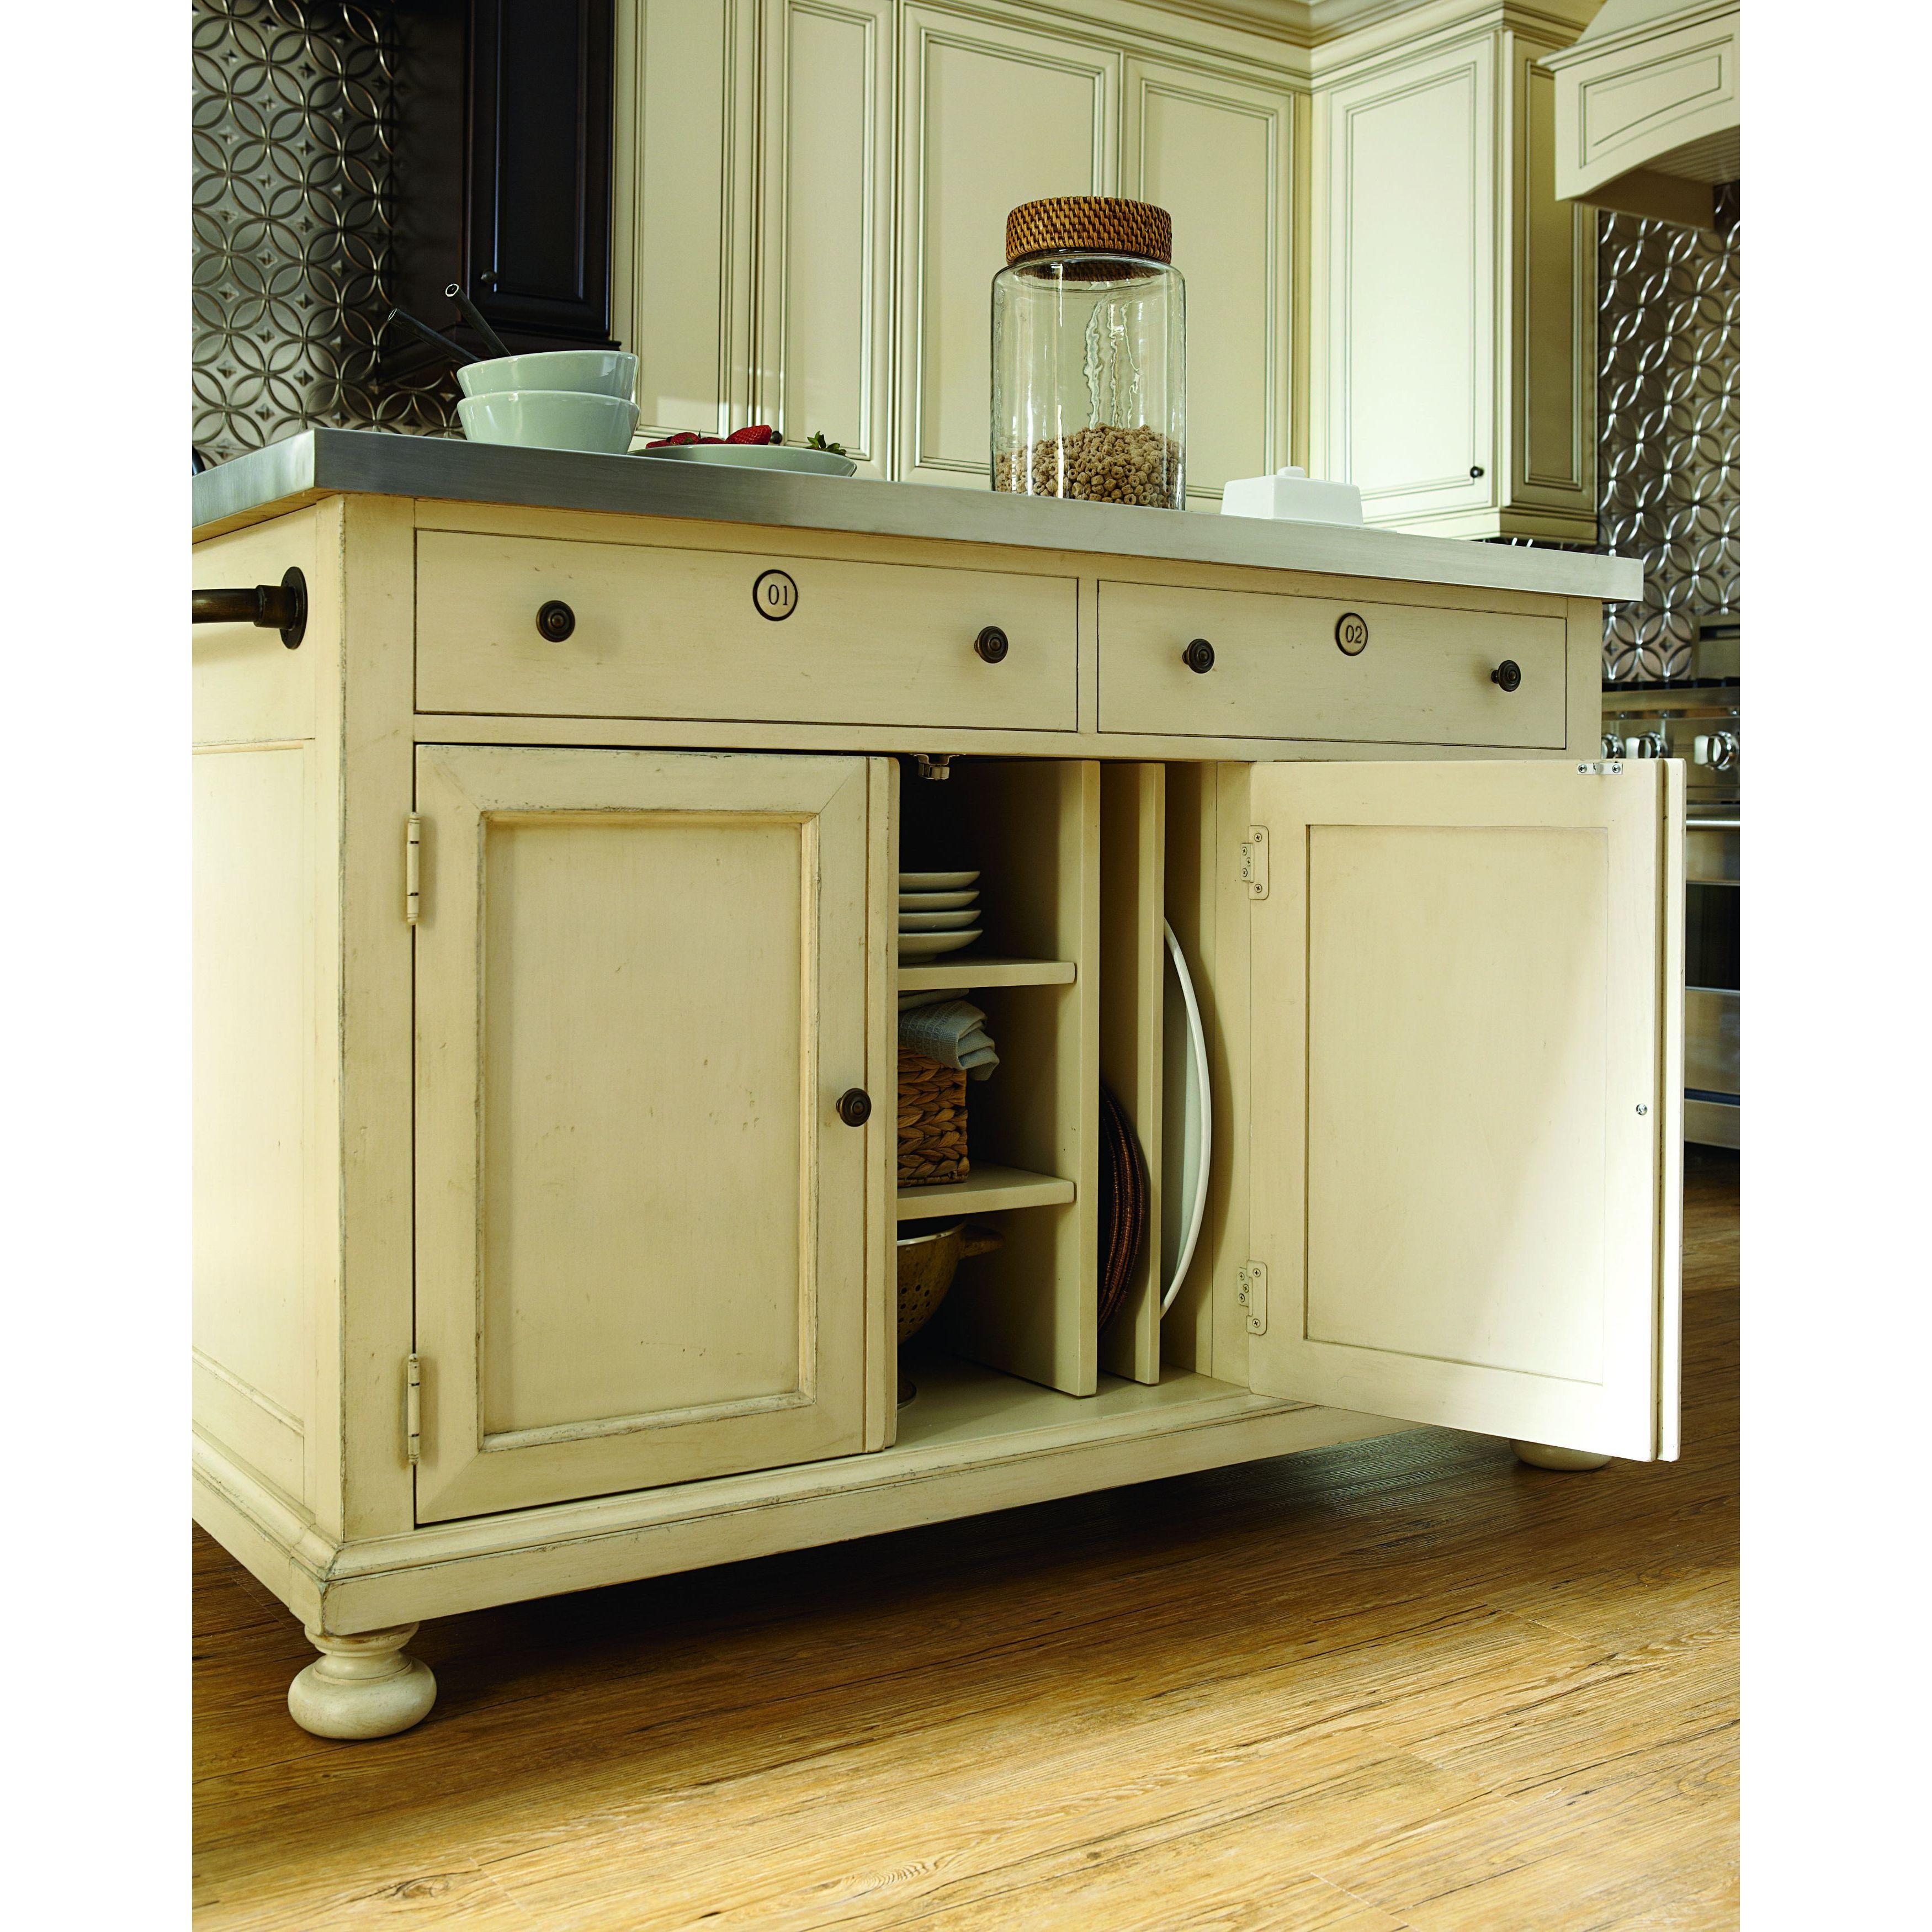 Simple Office Room Design, Shop Paula Deen Home River House Kitchen Island Overstock 11552192